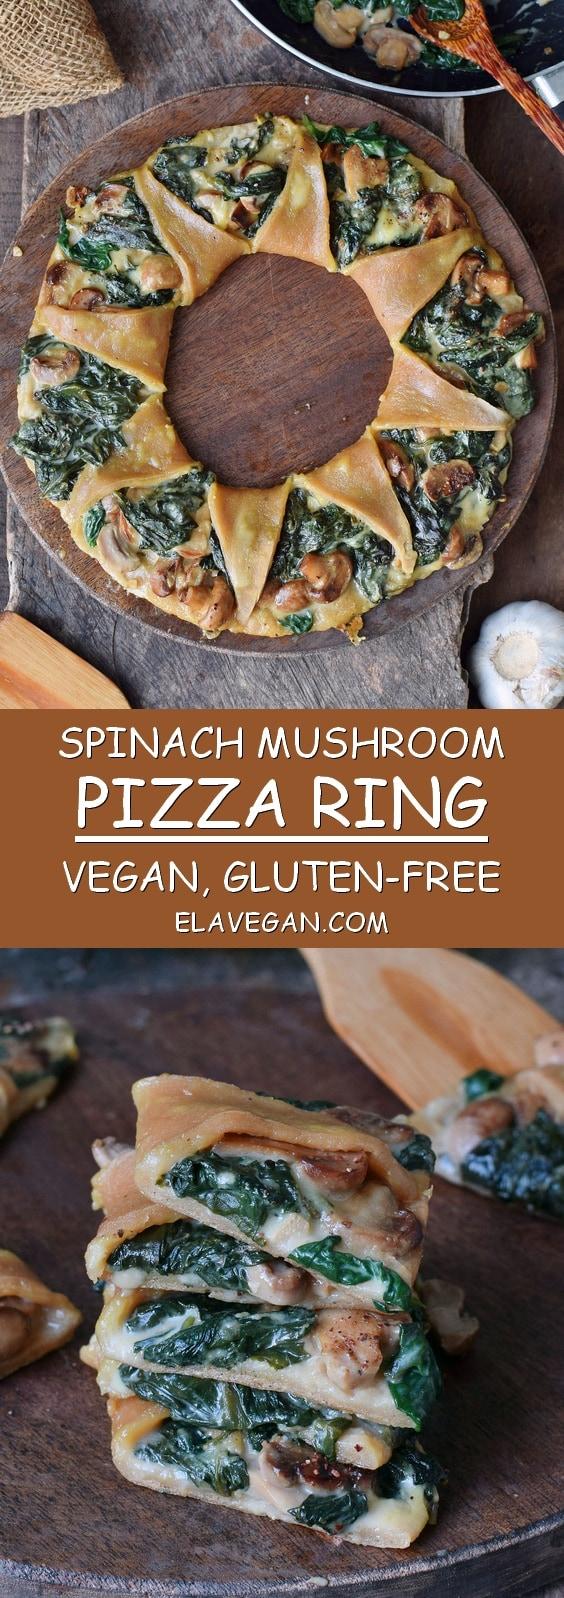 spinach mushroom pizza Crescent ring vegan gluten-free recipe